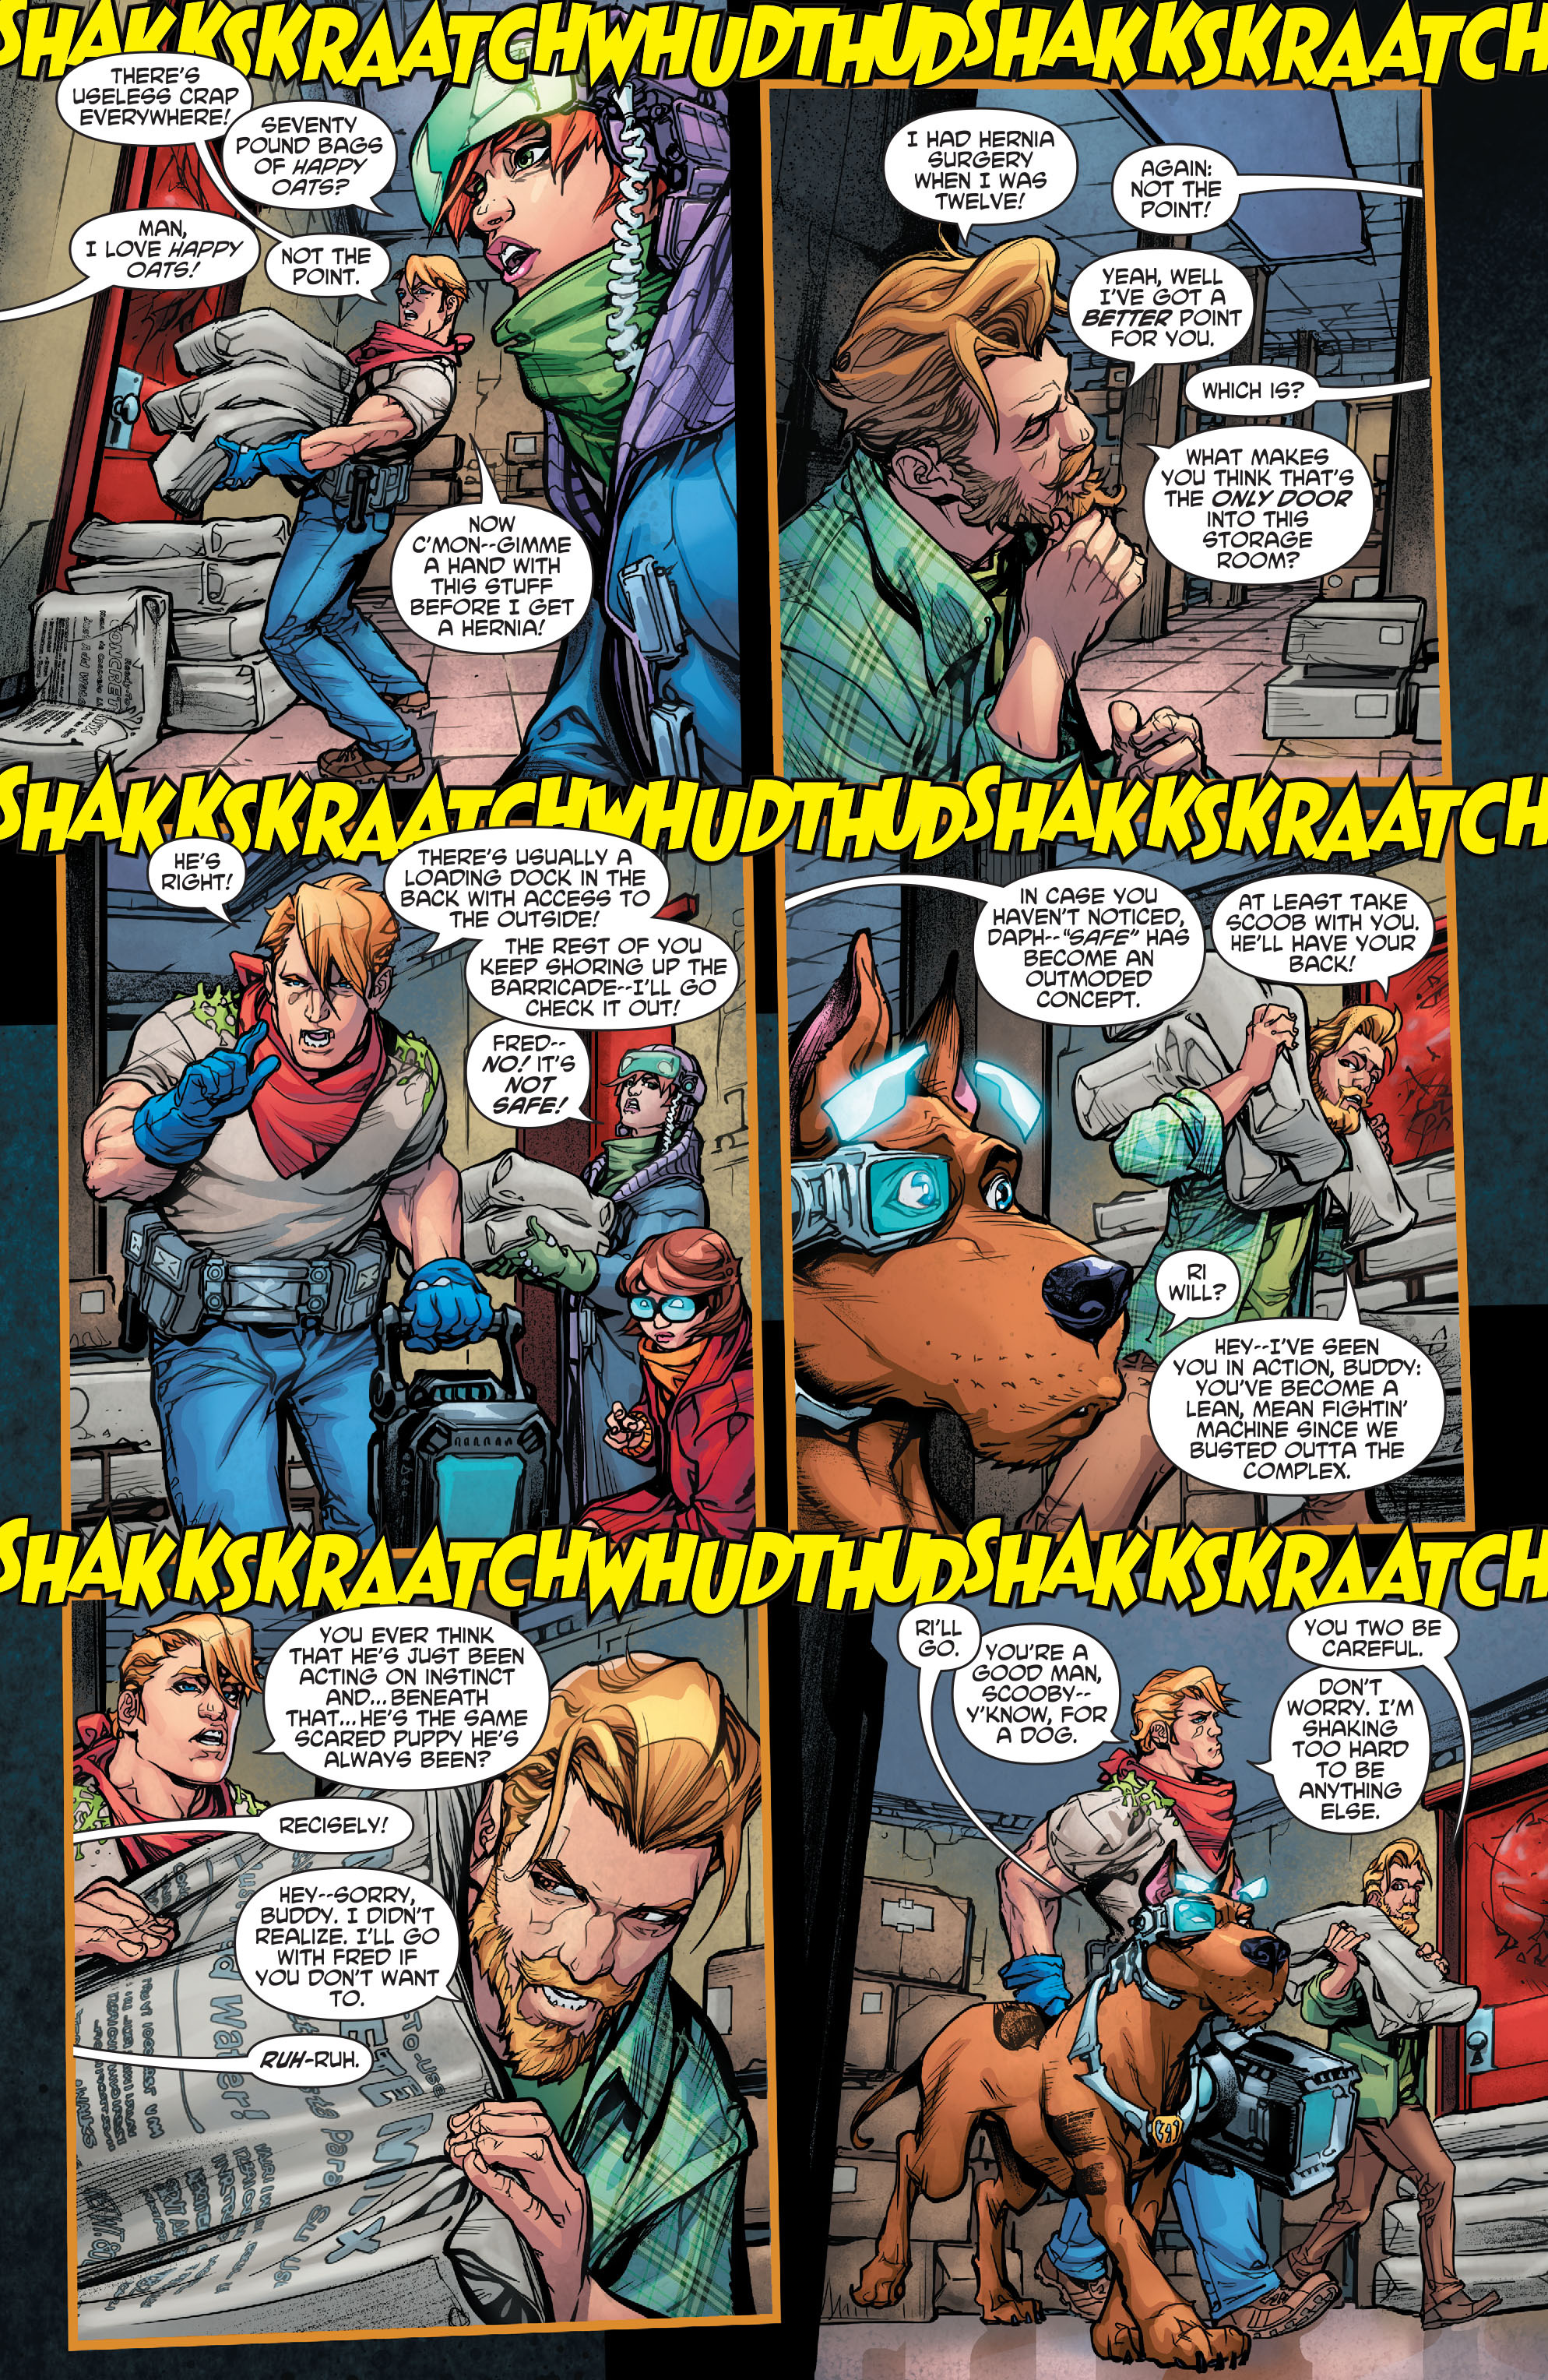 Read online Scooby Apocalypse comic -  Issue #5 - 11